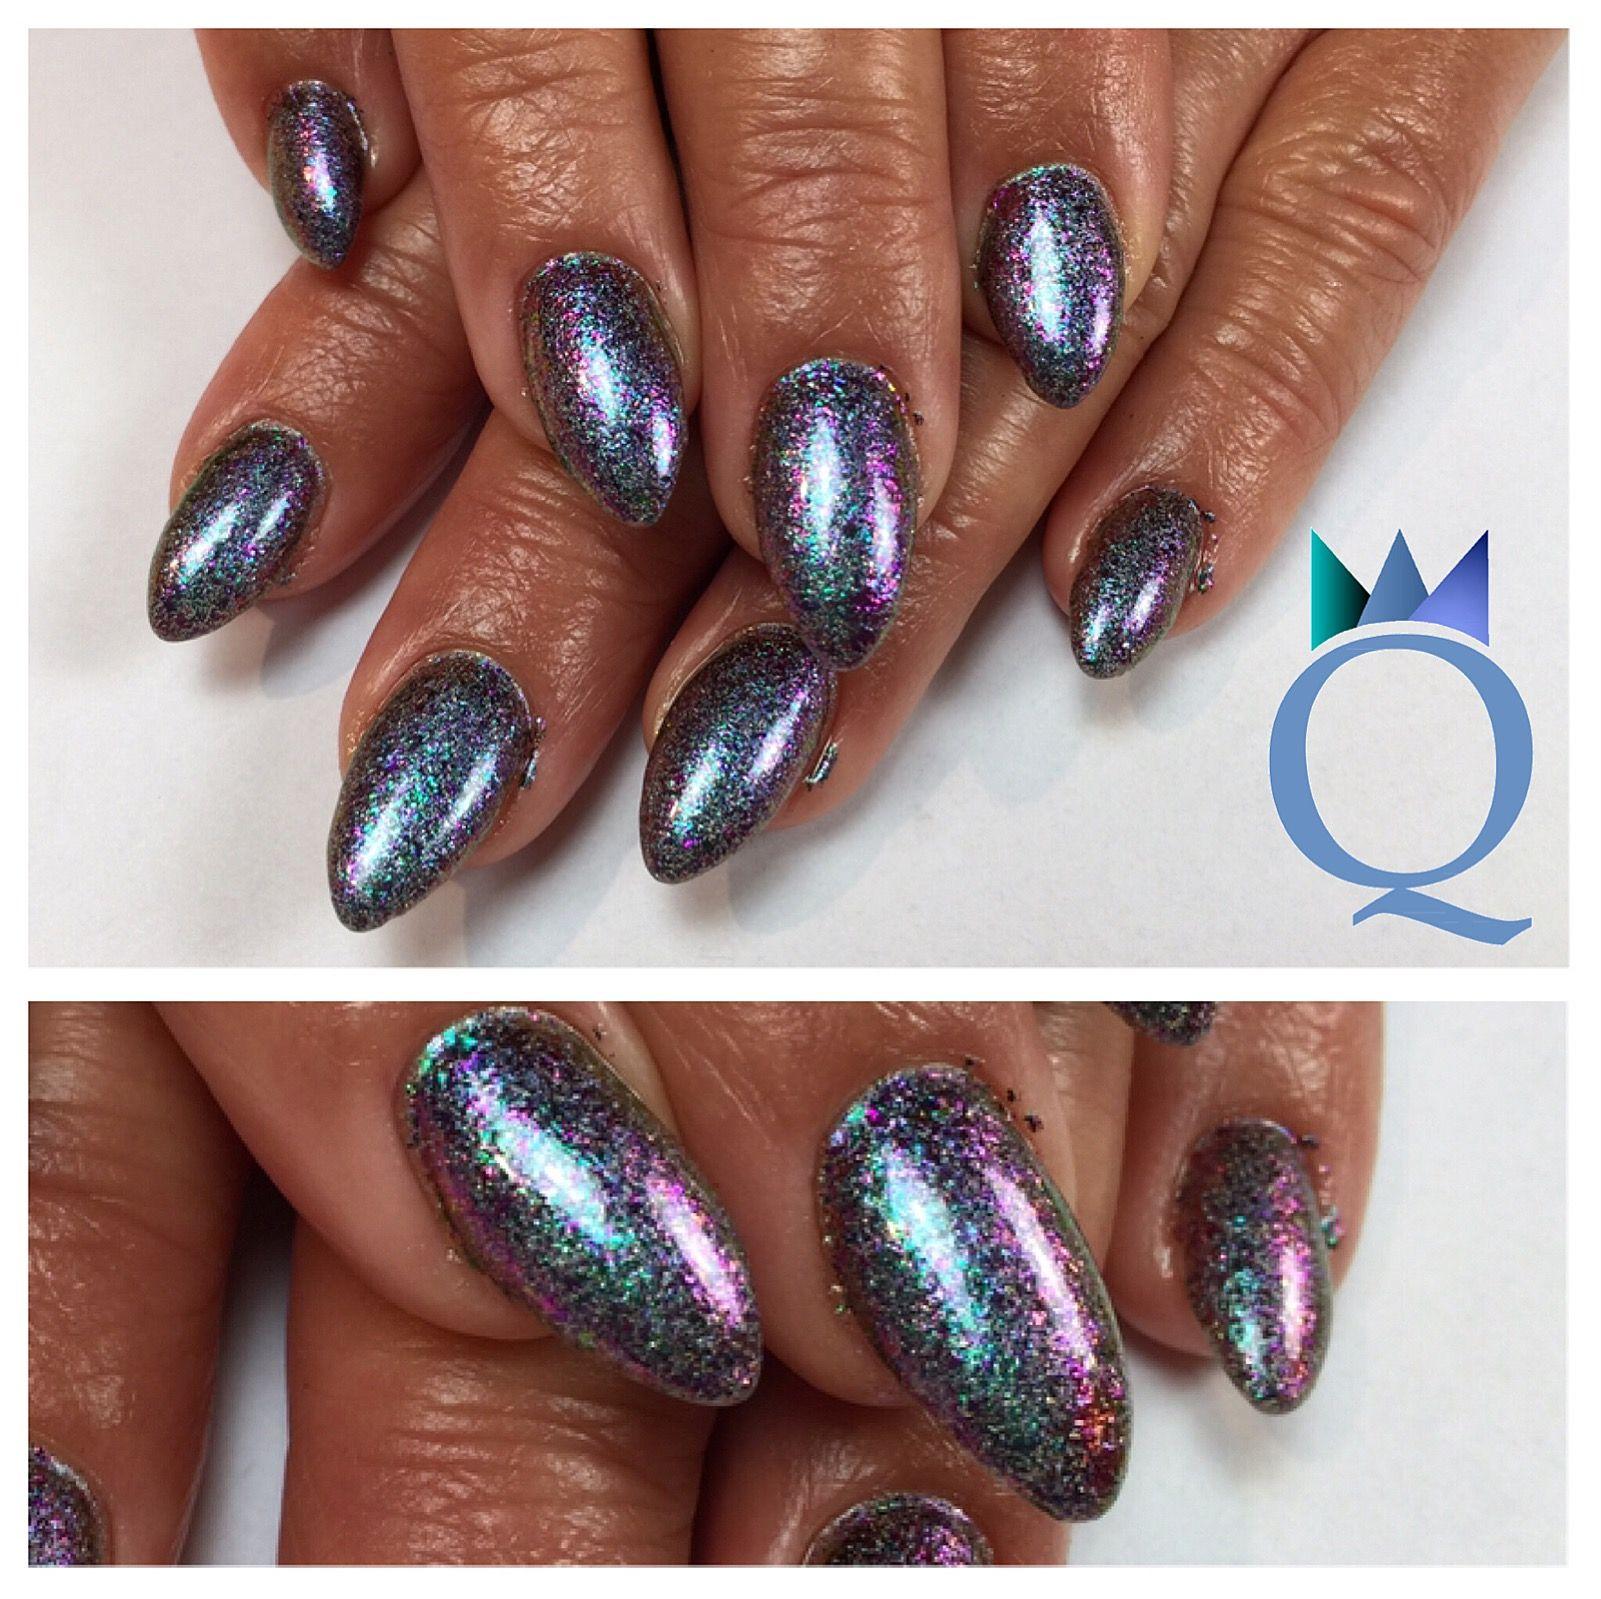 almondnails #gelnails #nails #holoflakes #mandelform #gelnägel ...